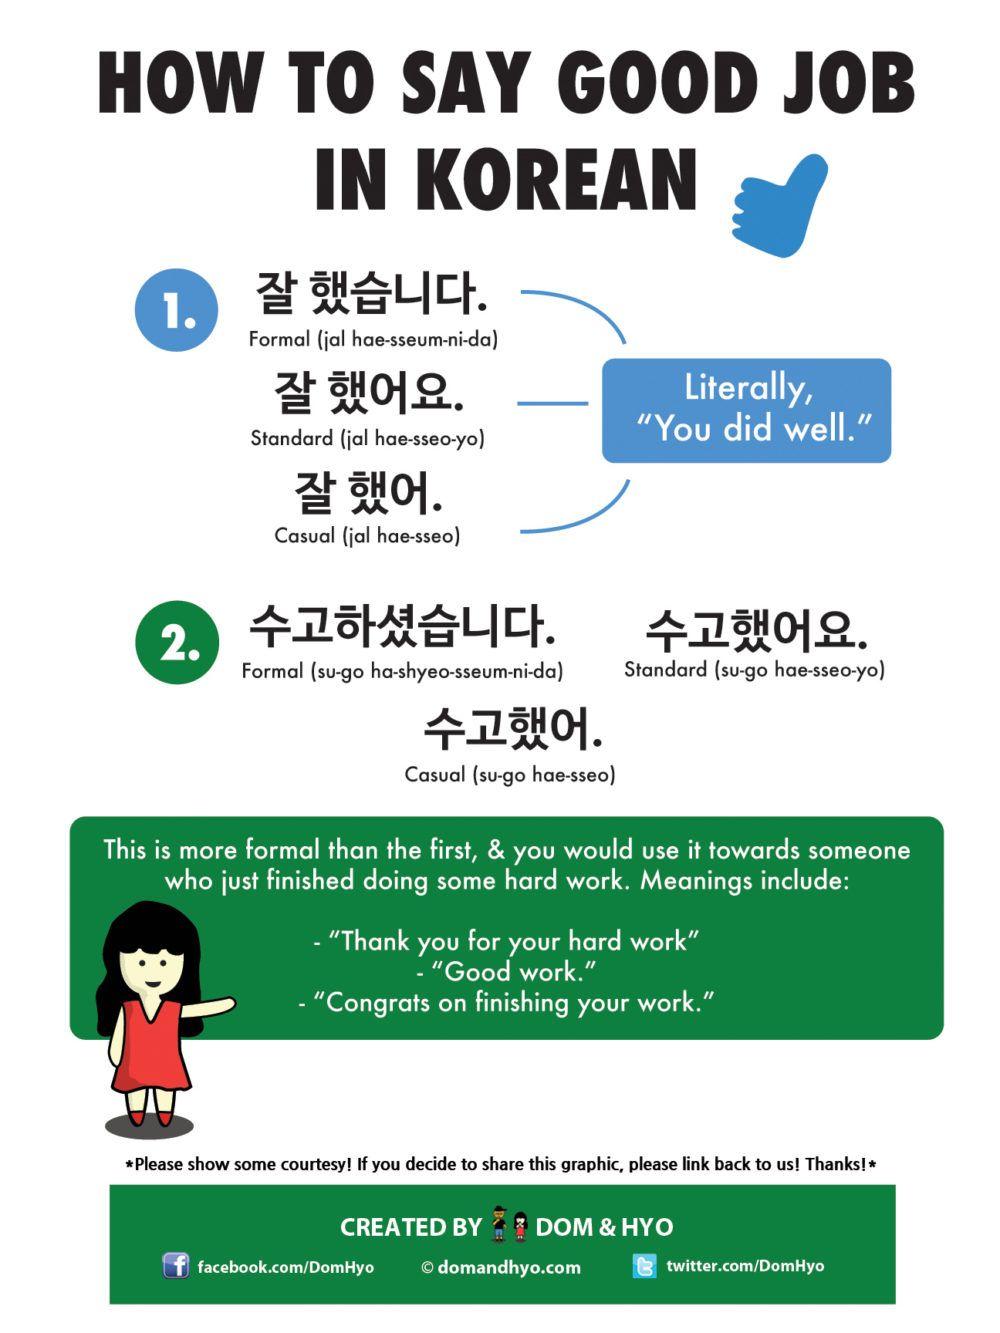 How to say good job in korean korean language learning